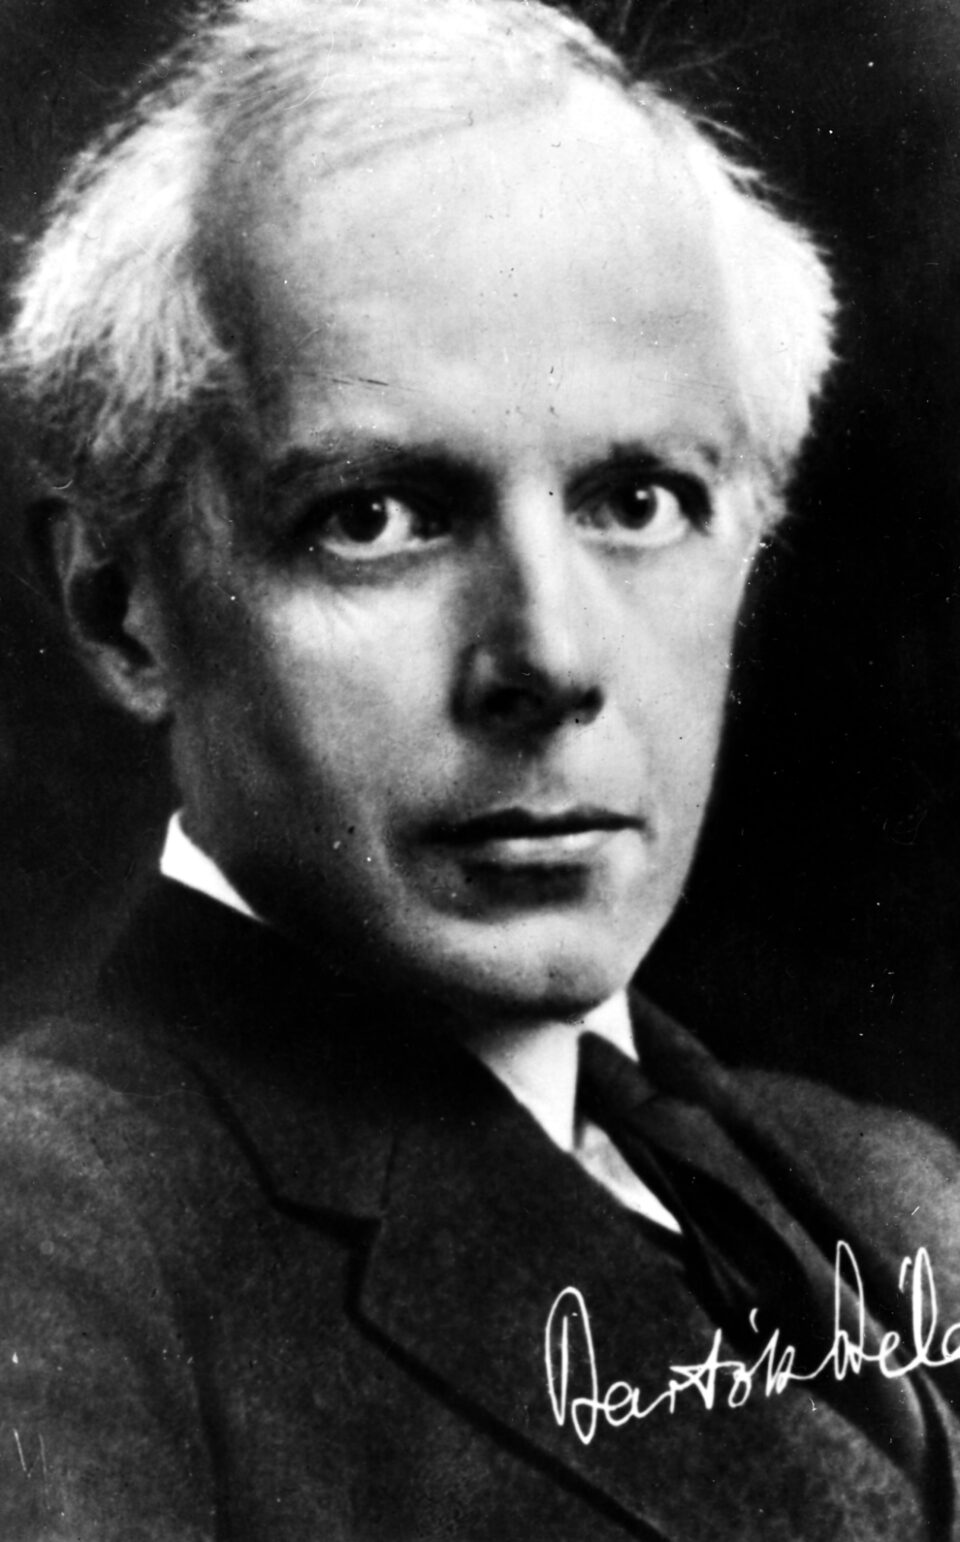 Béla Bartók (1881-1945): Rapsódia para Piano e Orq. / Scherzo para Piano e Orq. / Rapsódias Nº 1 e 2 para Violino e Orq. (Tusa / Németh / Lehel / Kovács / Ferencsik) #BRTK140 Vol. 16 de 29